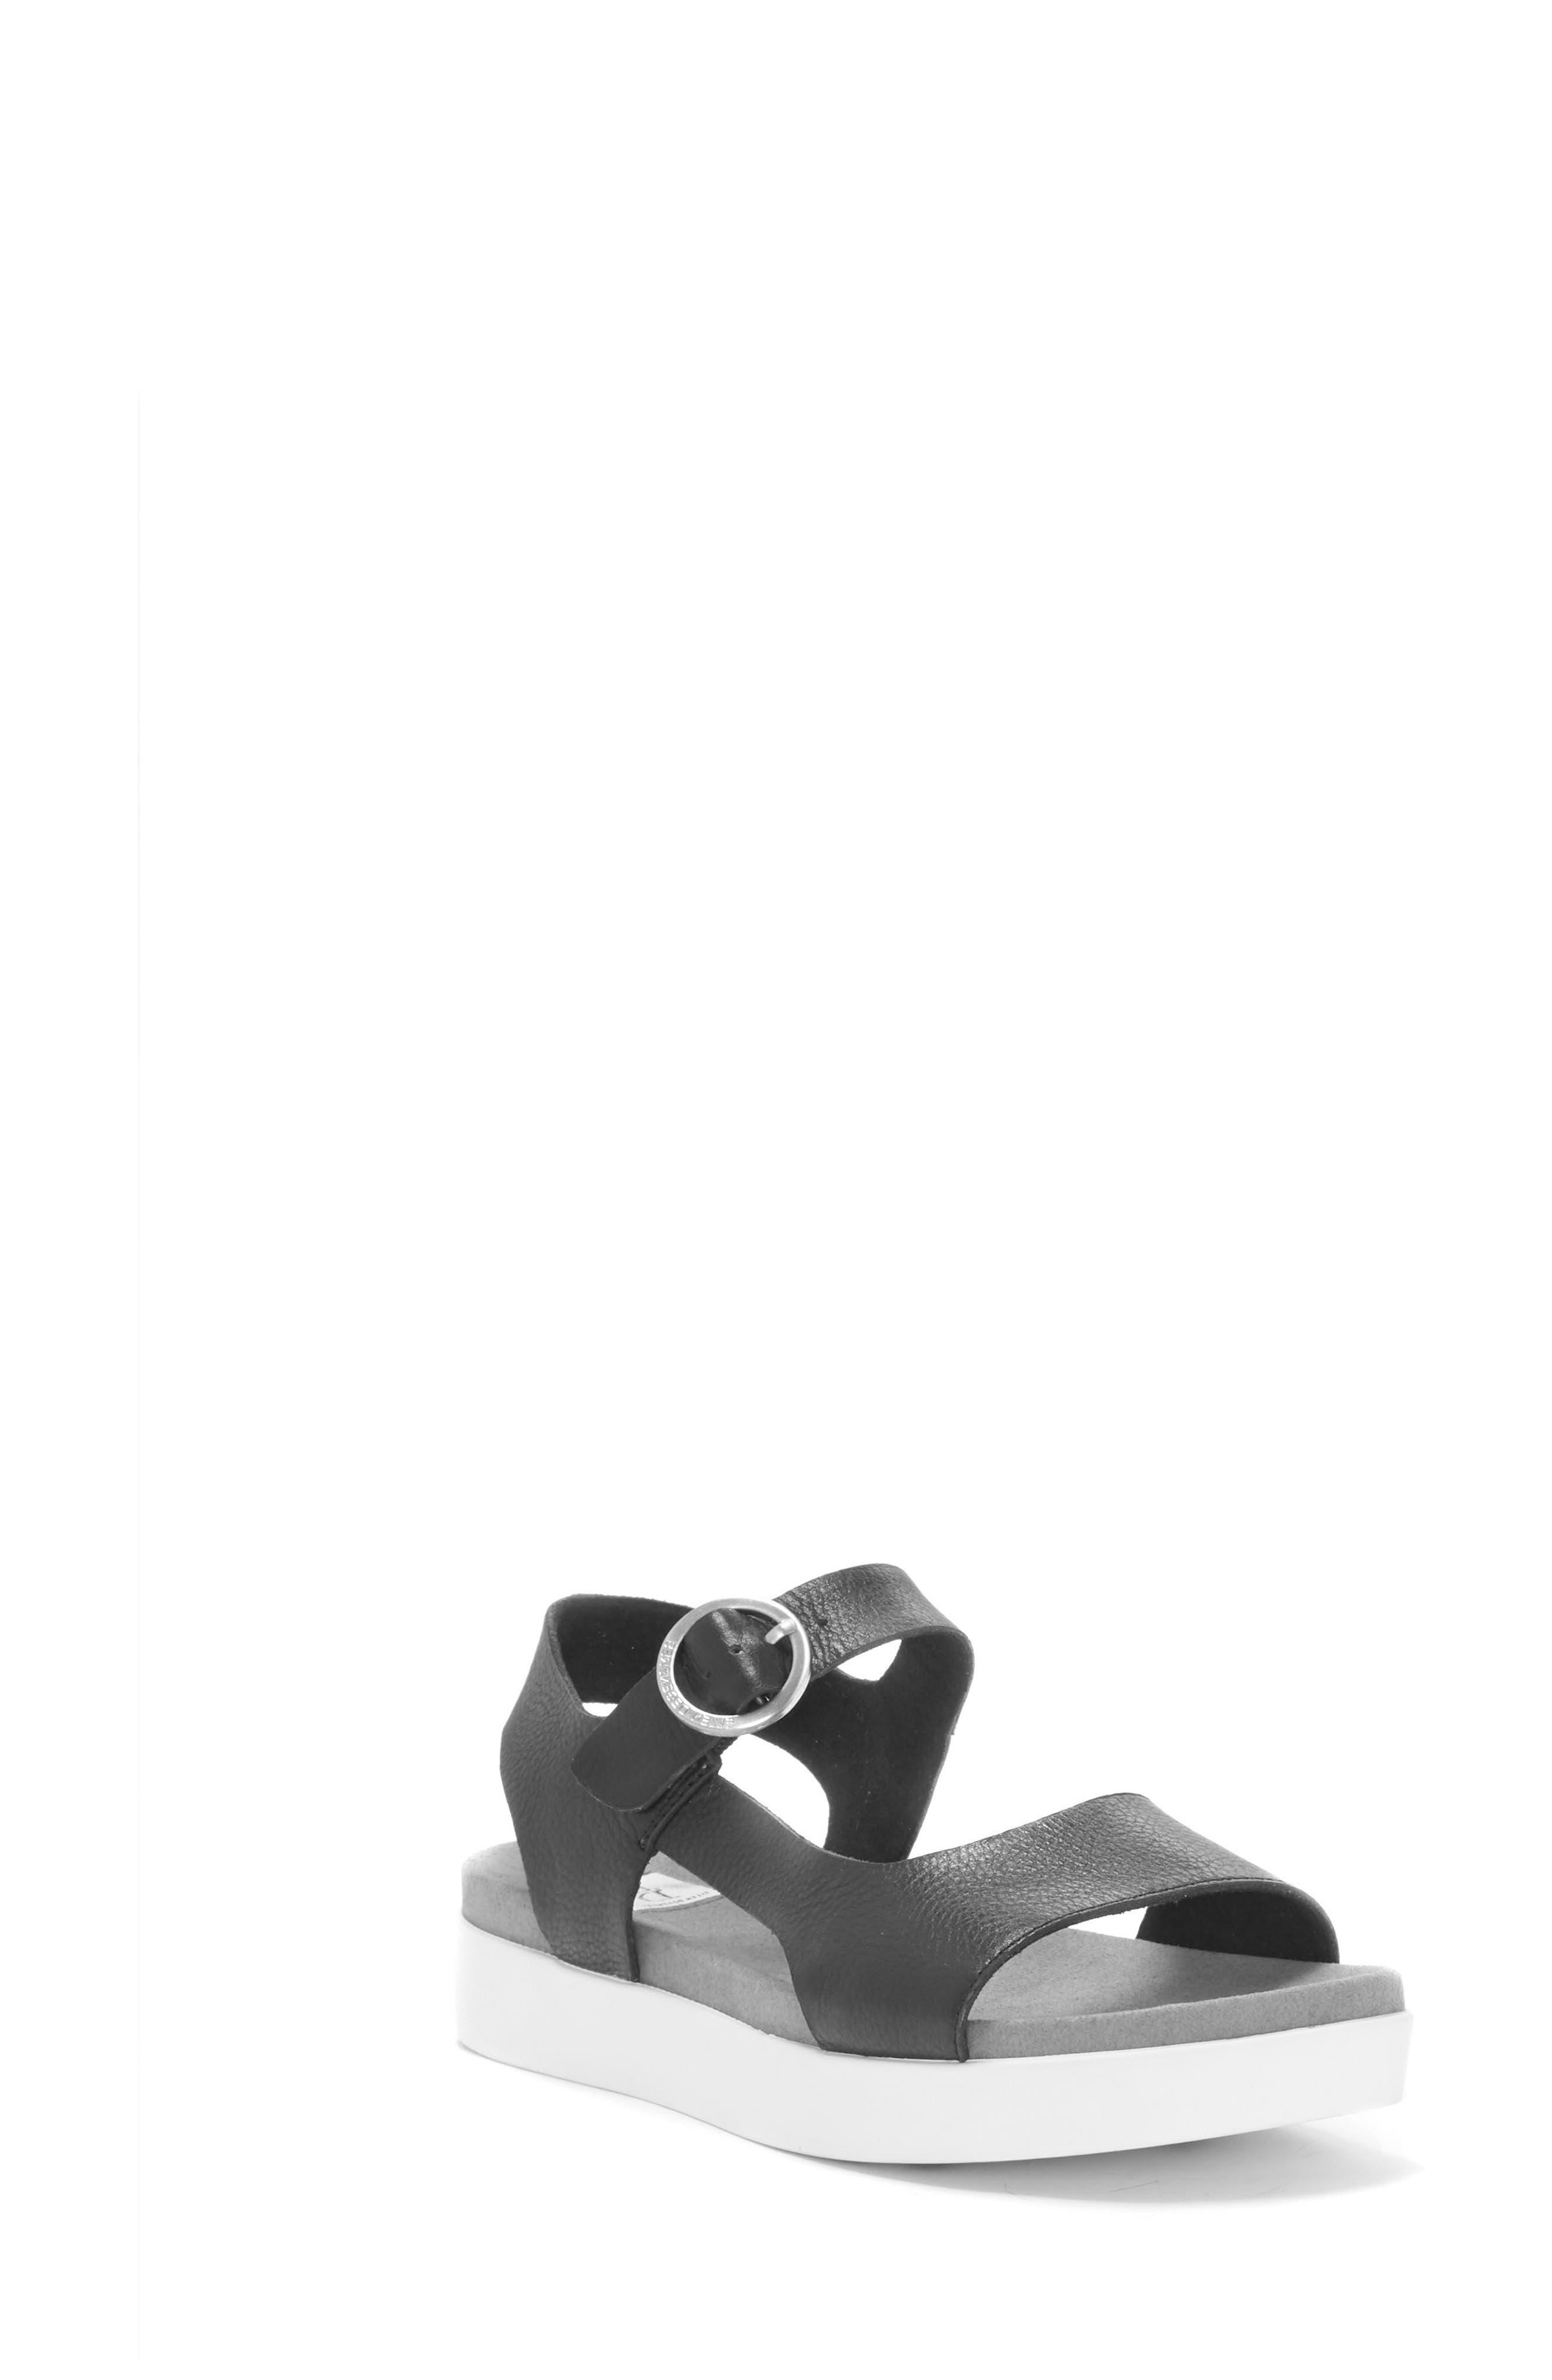 Caspin Sandal,                         Main,                         color, 002